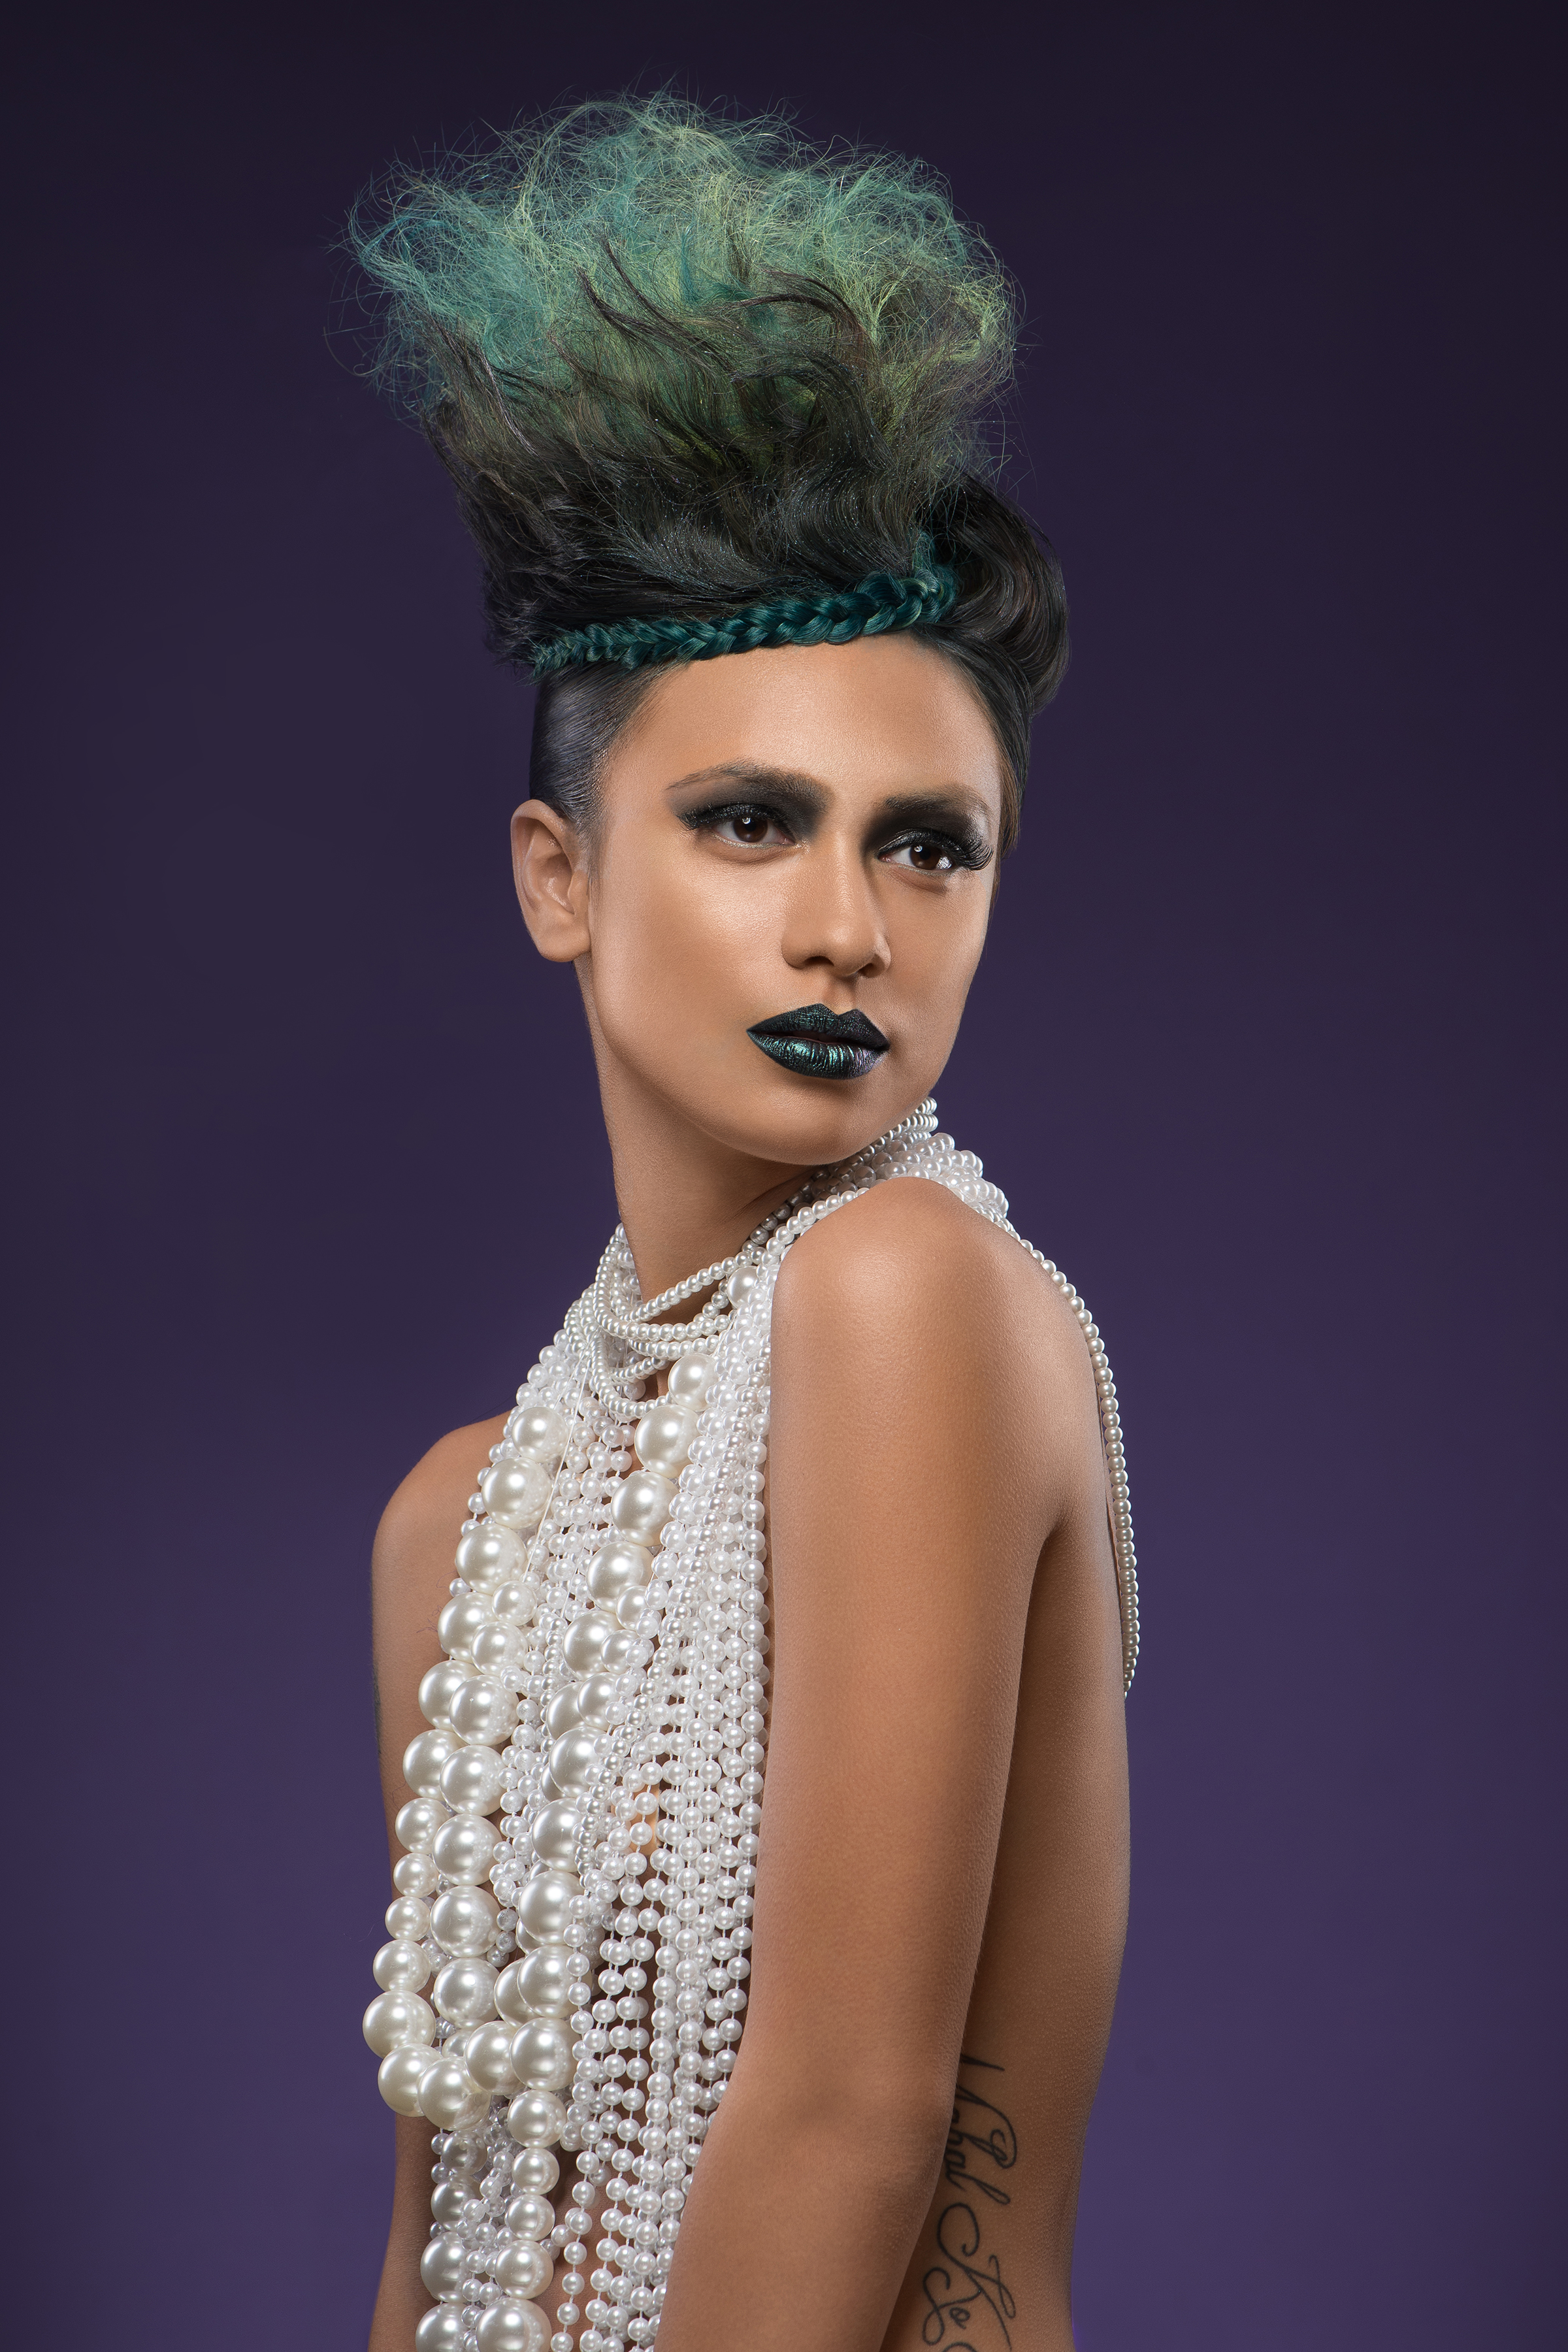 naha-newcomer-stylist2